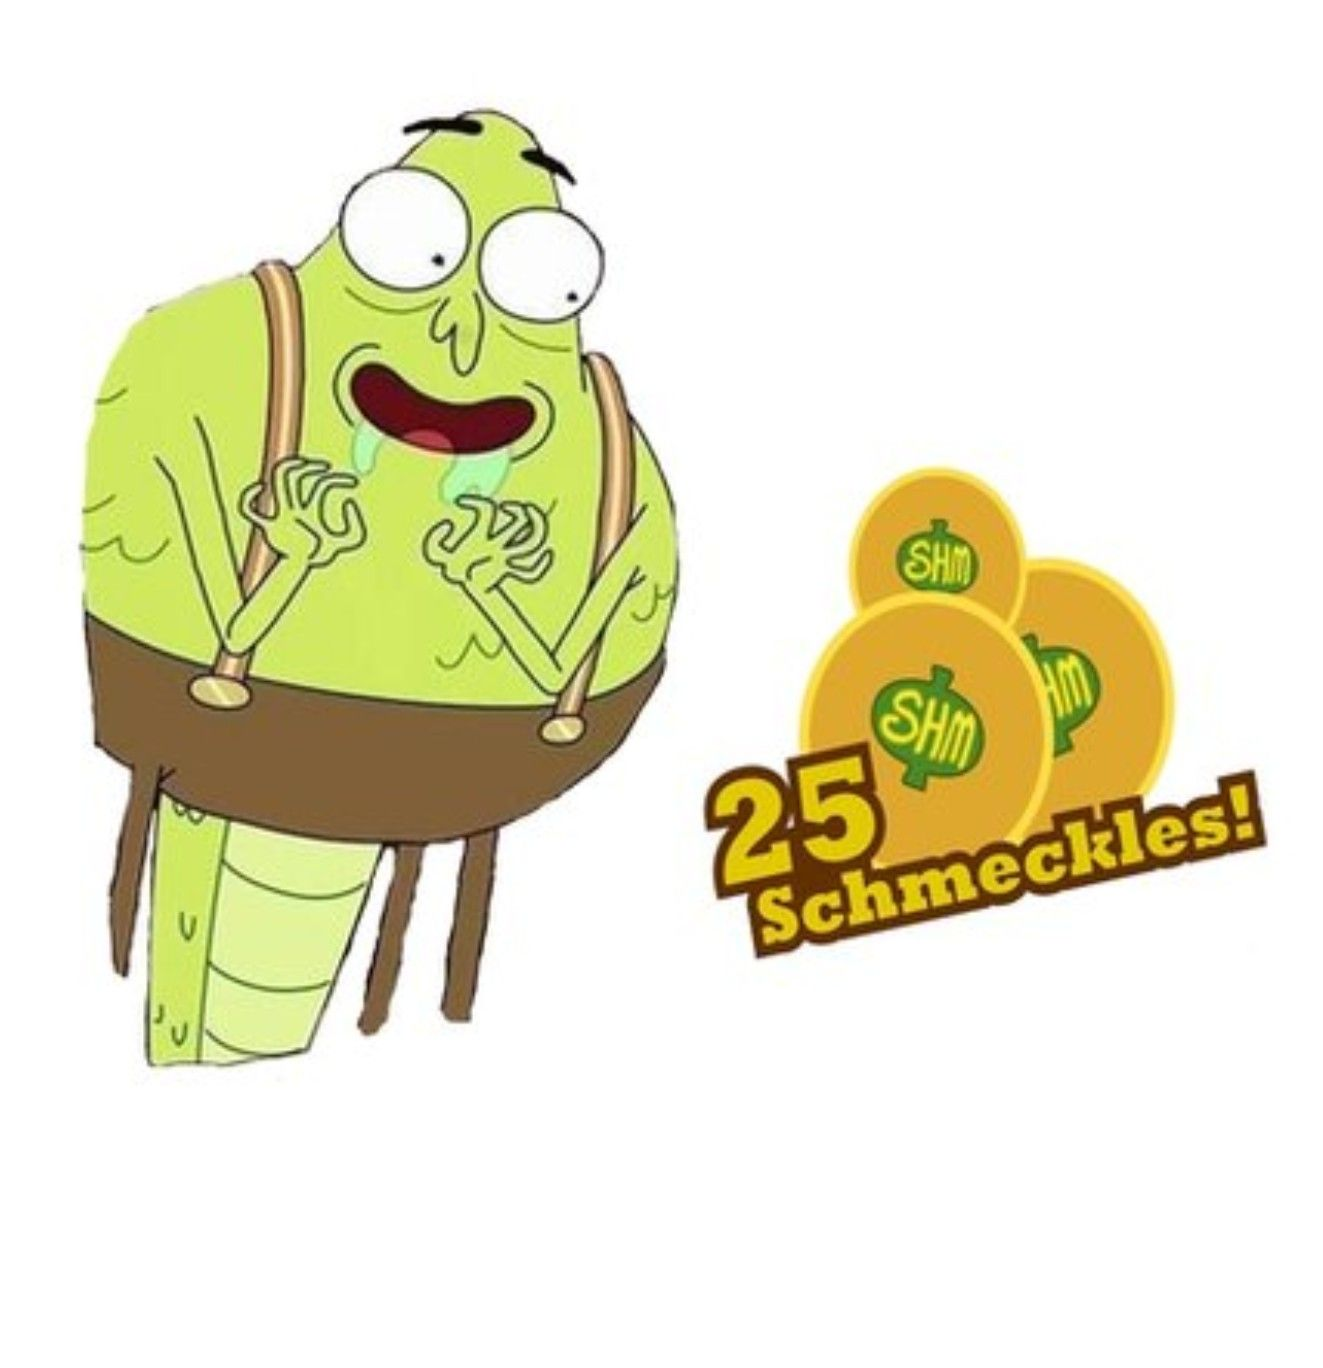 Schmeckles